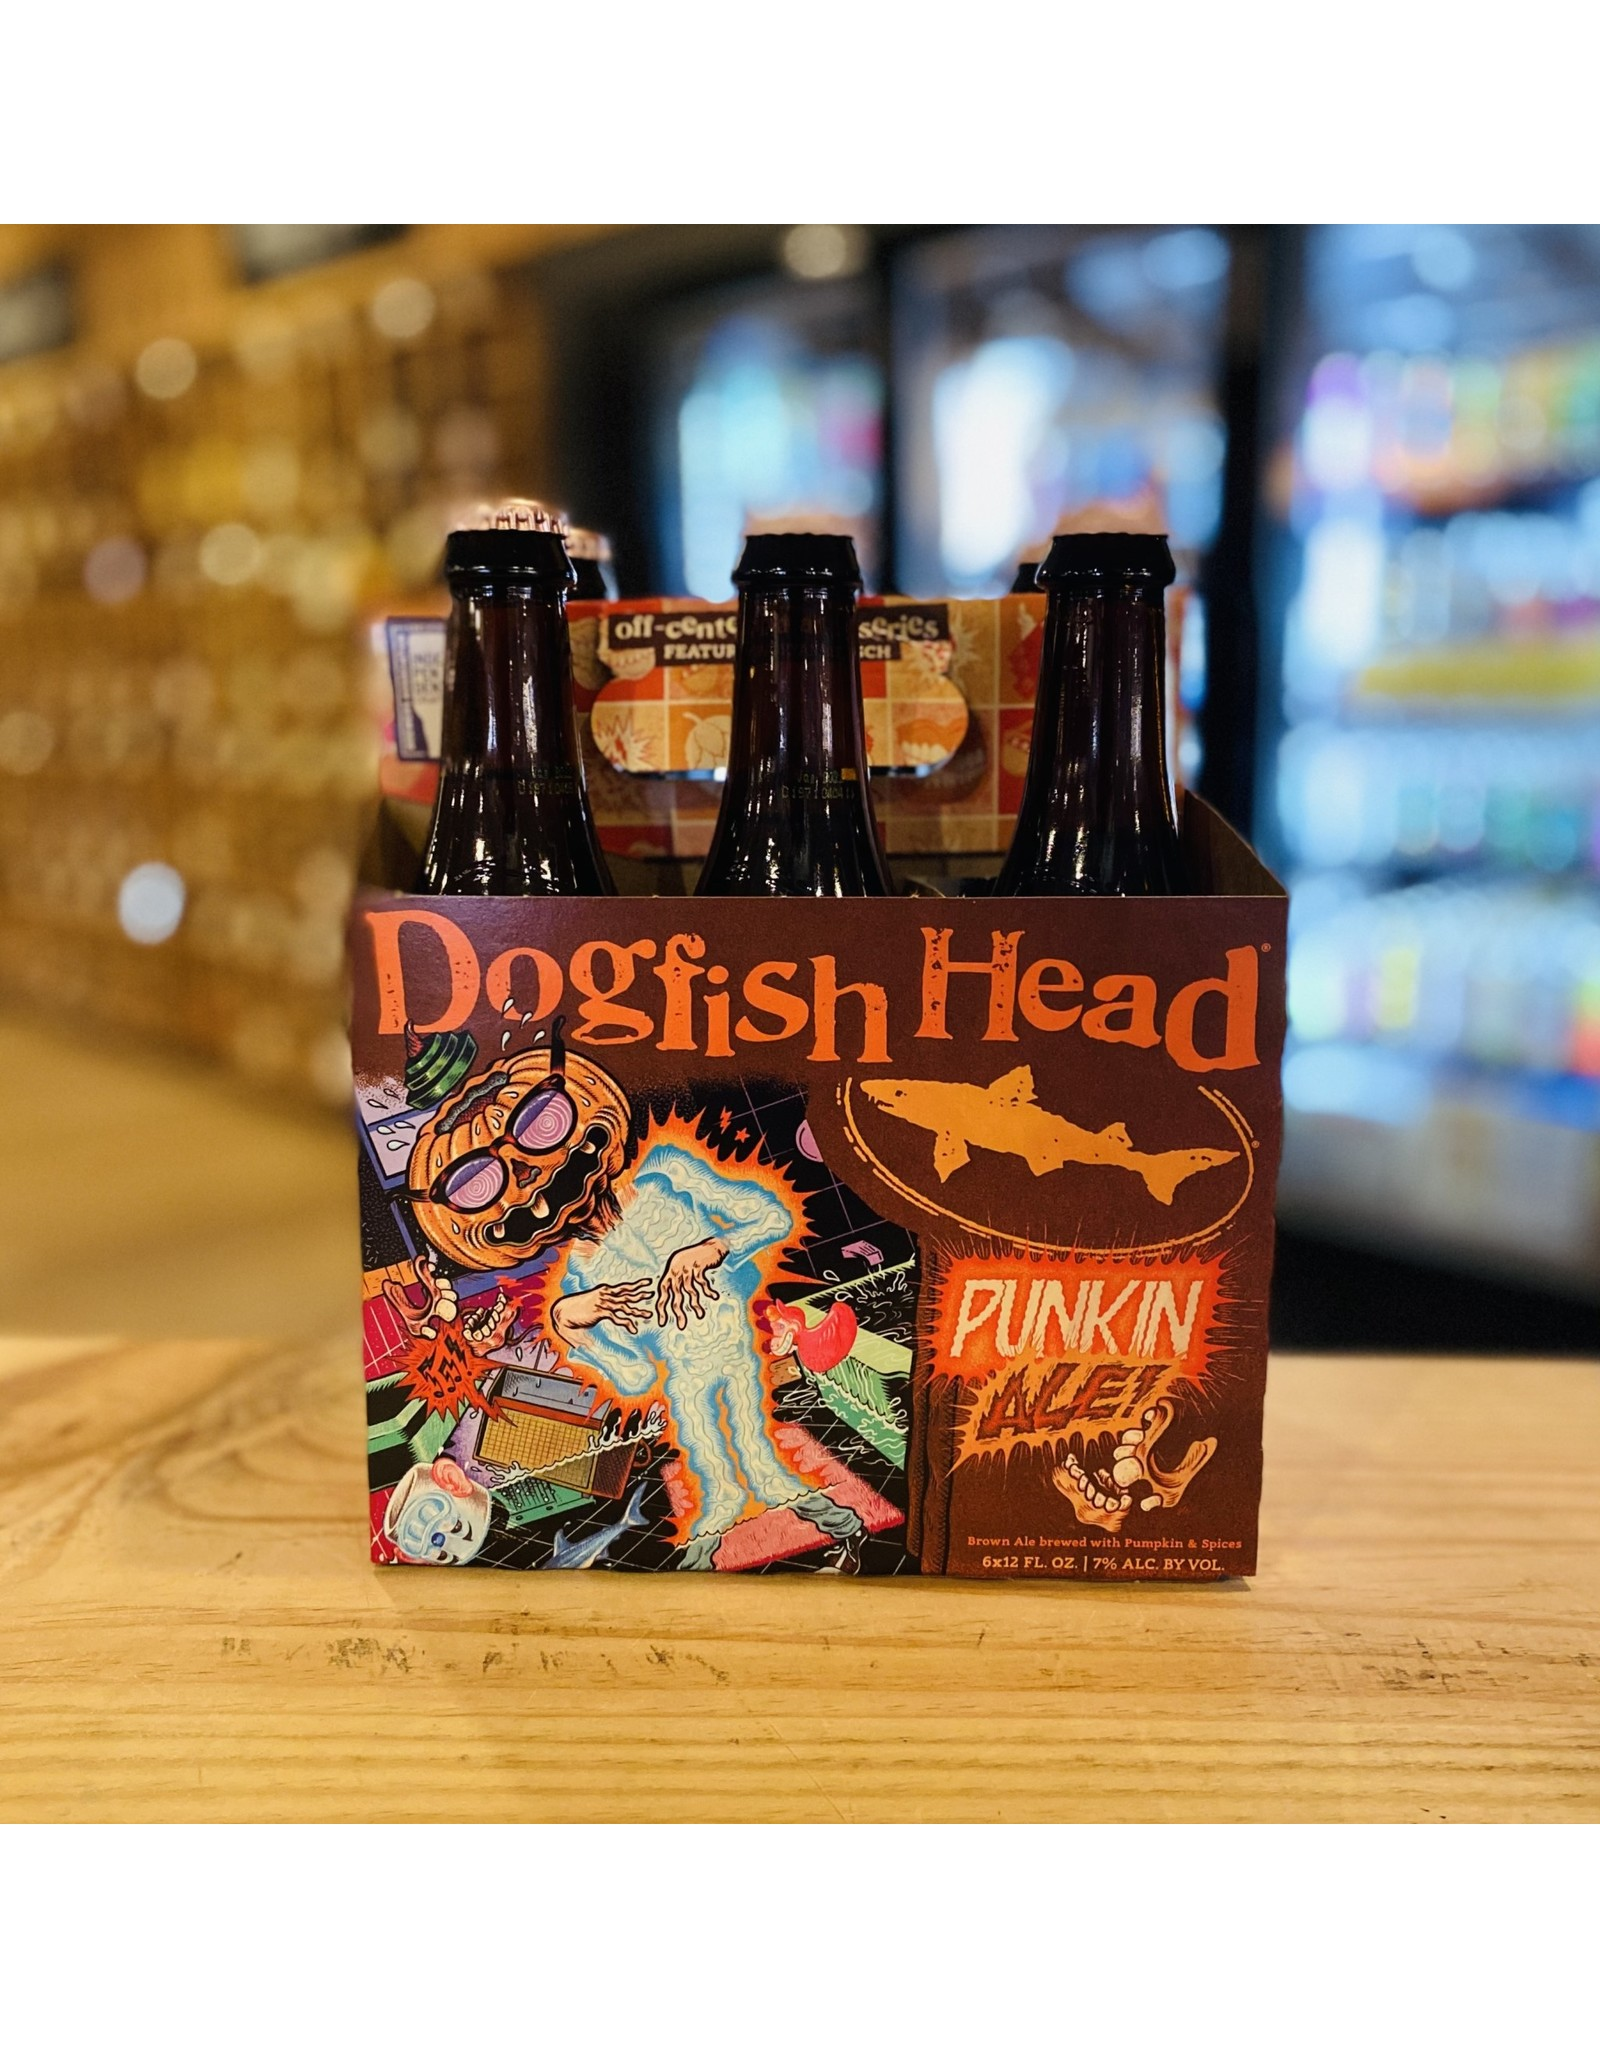 "Seasonal Dogfish Head ""Punkin Ale"" Brown Ale w/Pumpkin & Spices 6-Pack - Milton, DE"